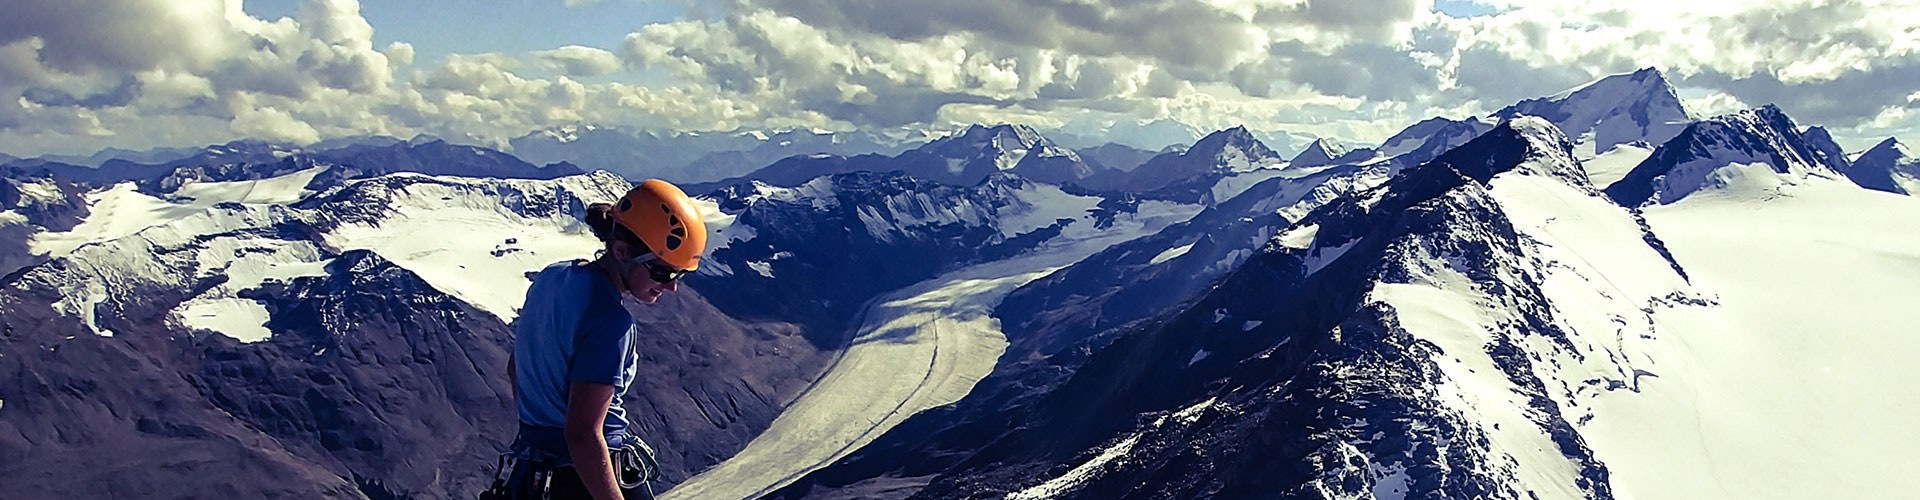 Retreat of the ice giants (Credit: Gabriel Sigmund via Imaggeo)